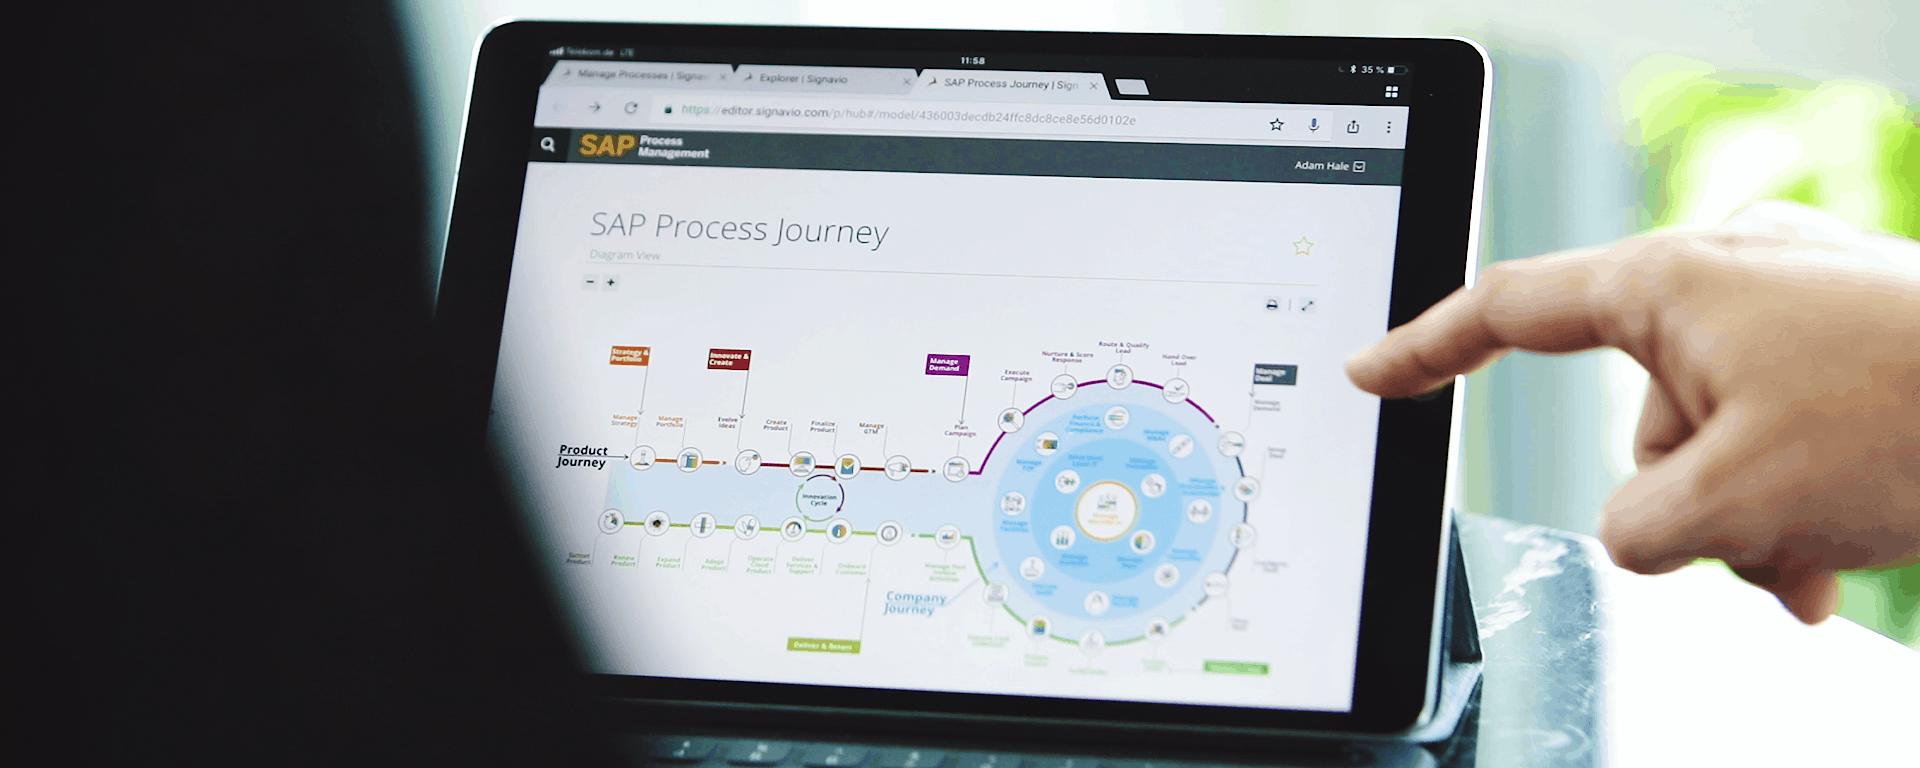 Creating the SAP Process Journey with Signavio